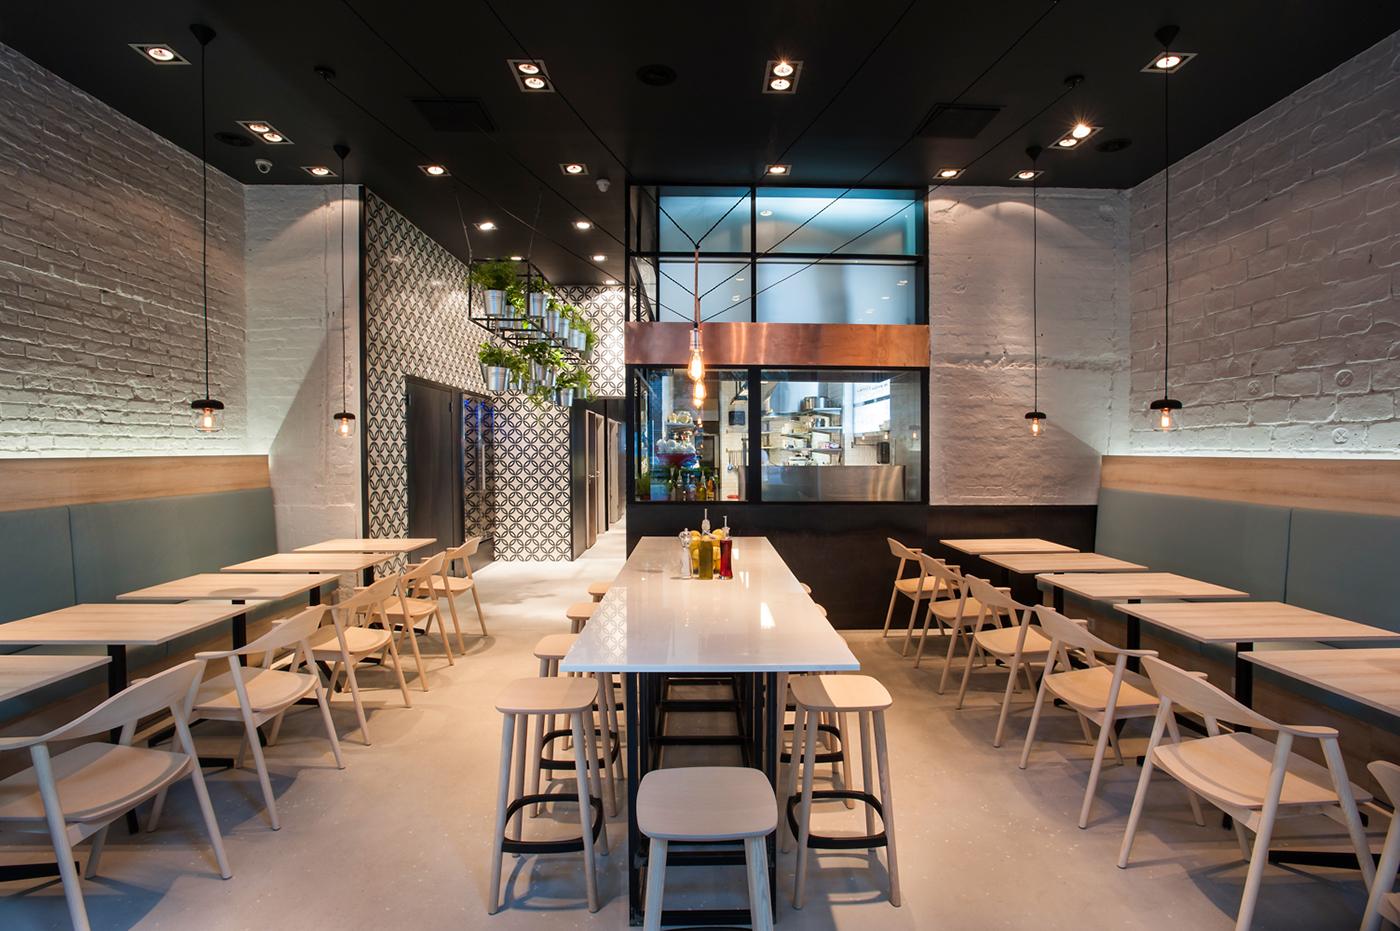 Mazi interior design 2016 on behance for Interior designs 2016